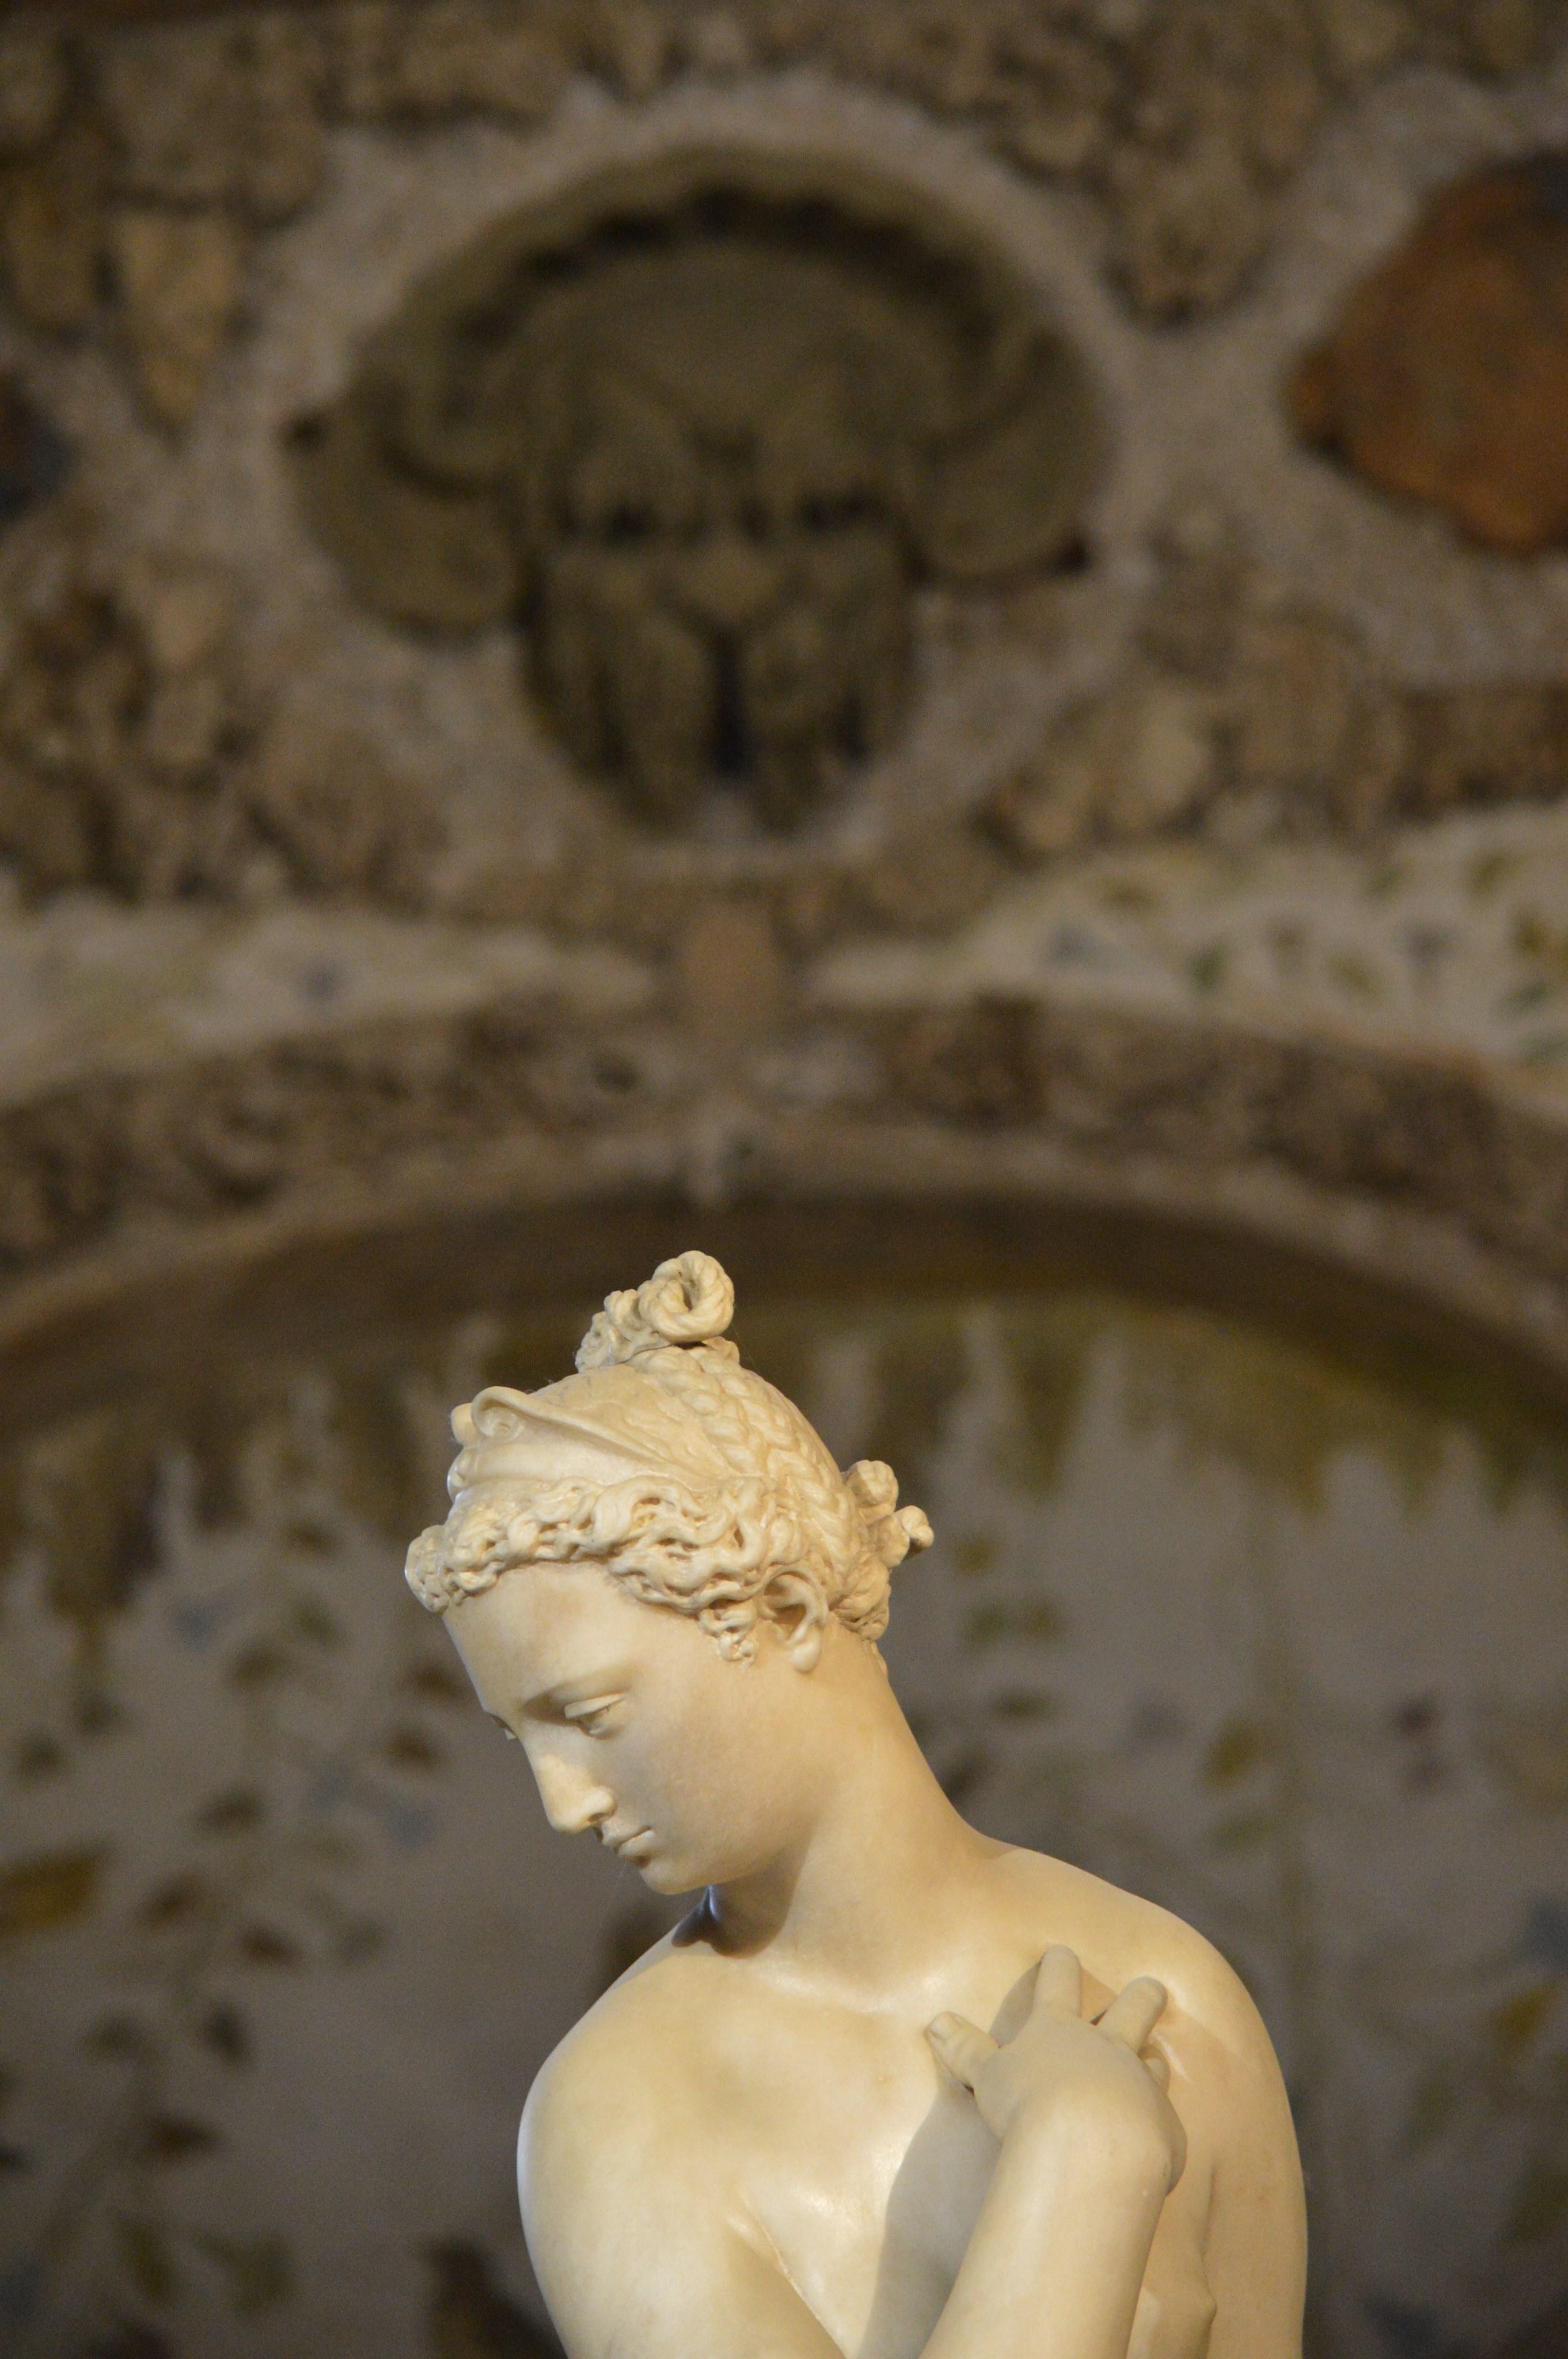 Photo from Heather Merla's research from the Grotta Grande, Boboli Gardens